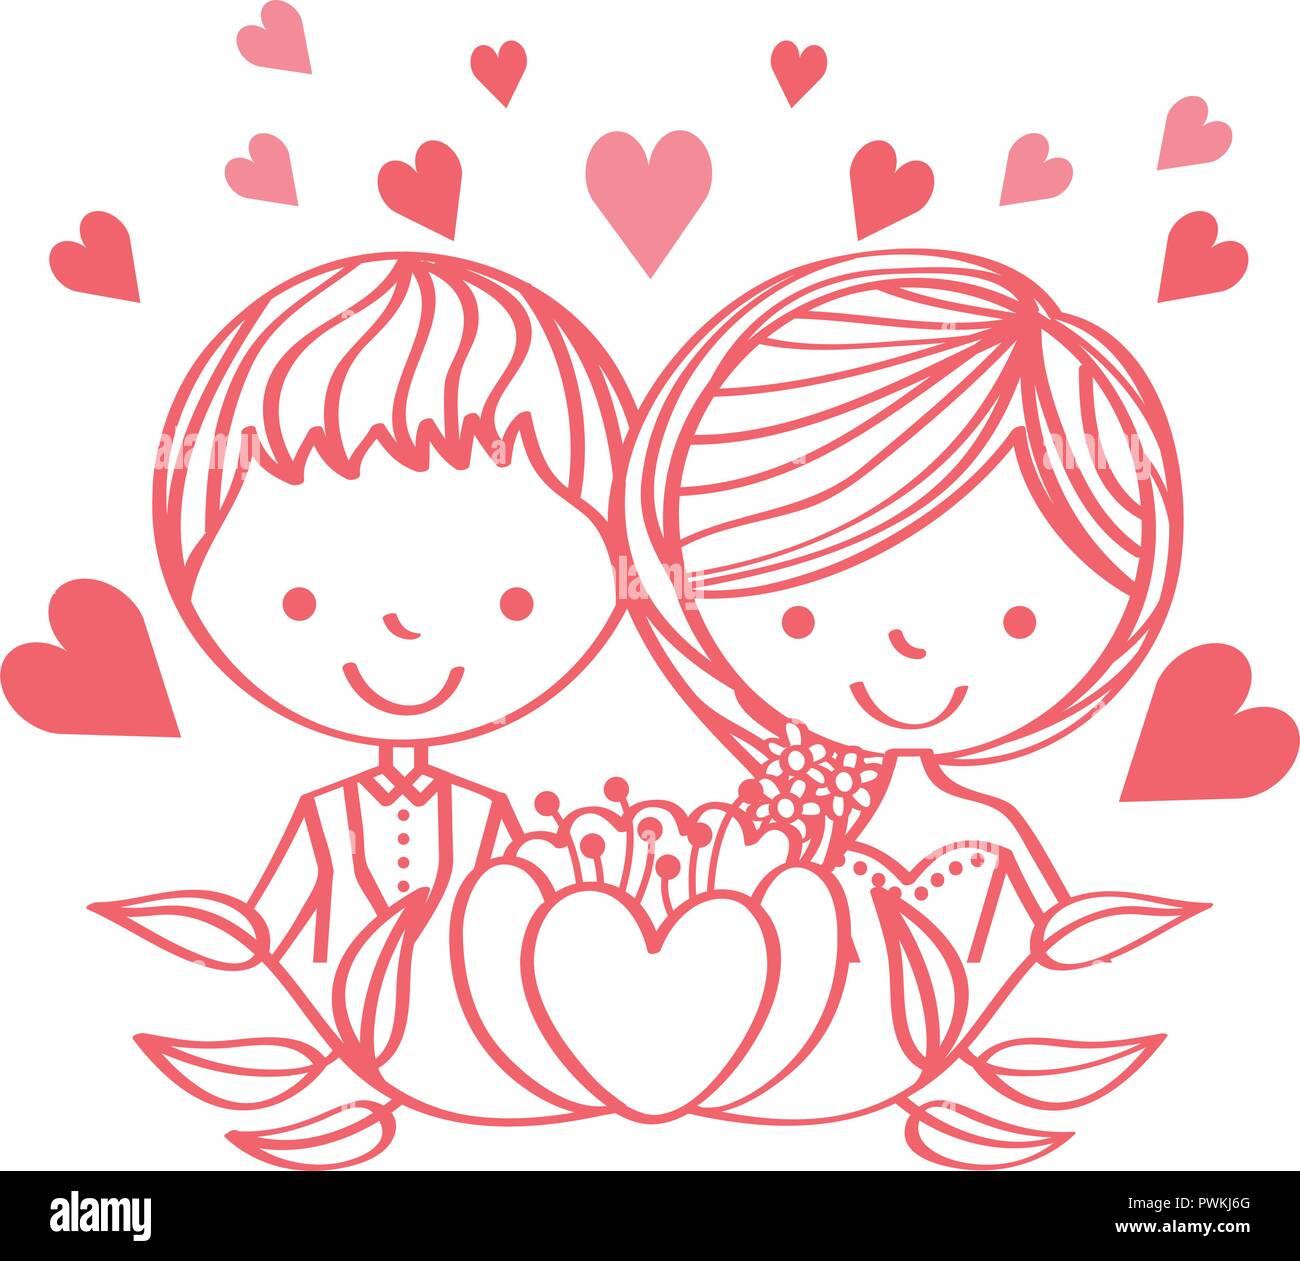 Wedding Day Cute Couple Cartoon Flowers Love Vector Illustration Stock Vector Image Art Alamy